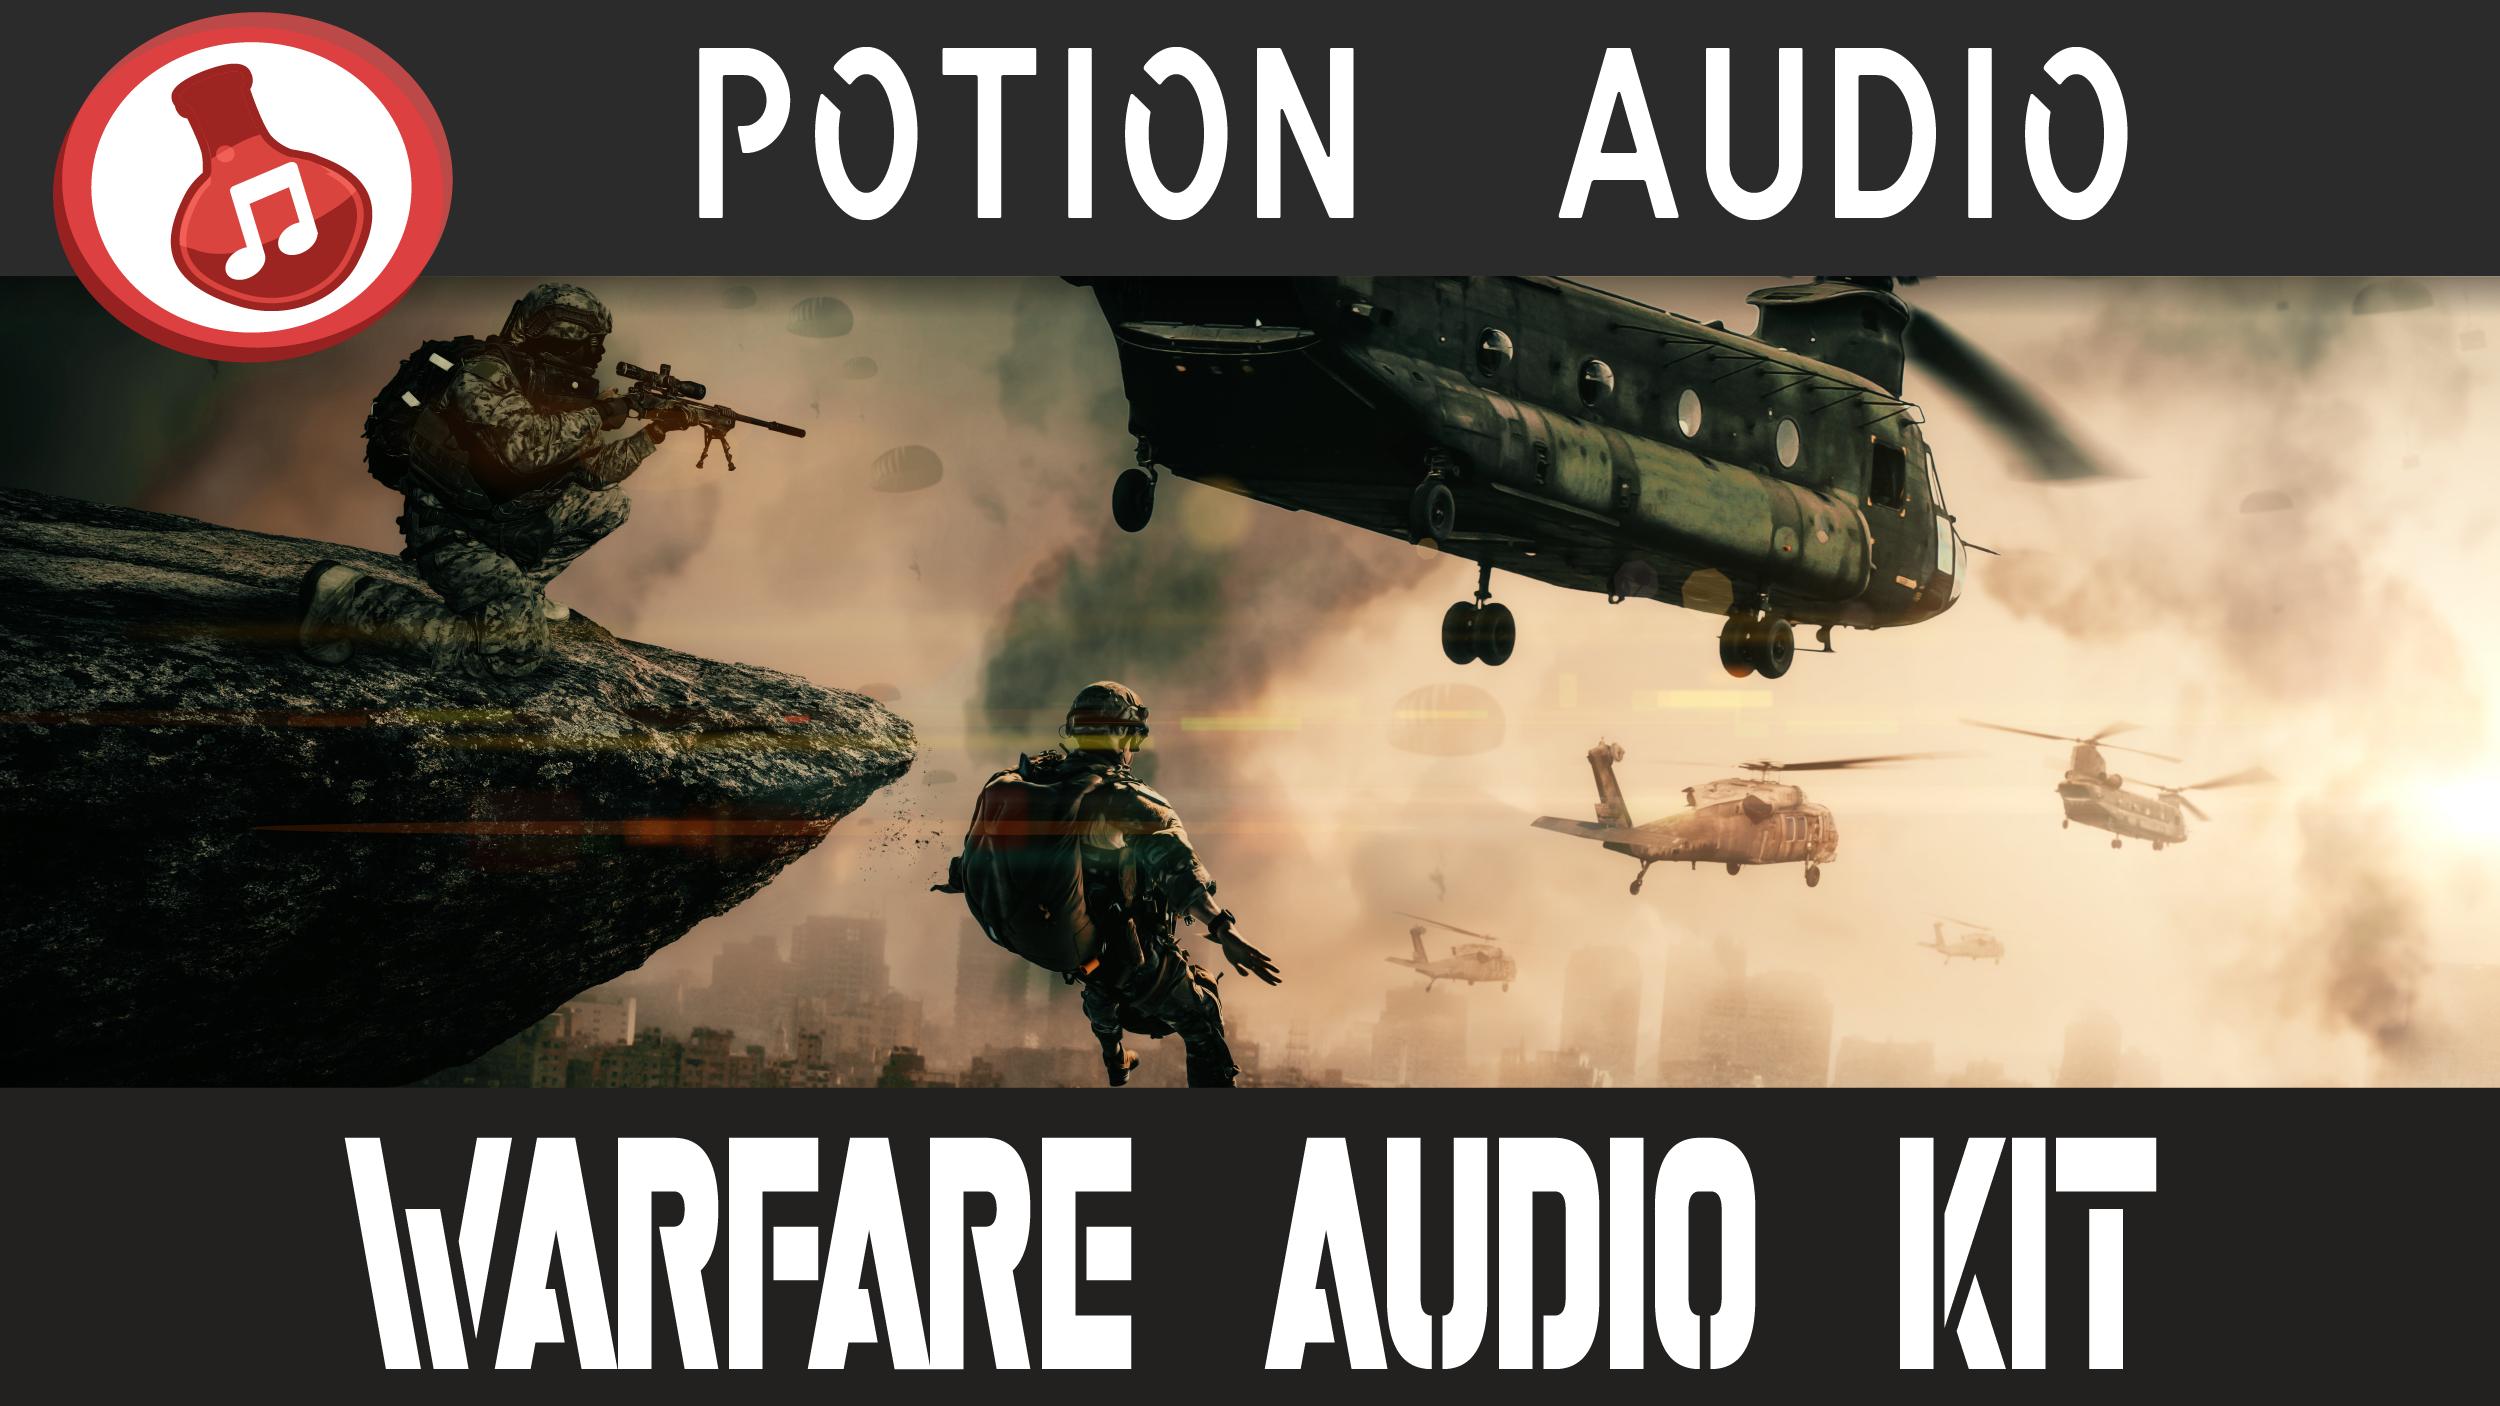 Warfare Audio Kit